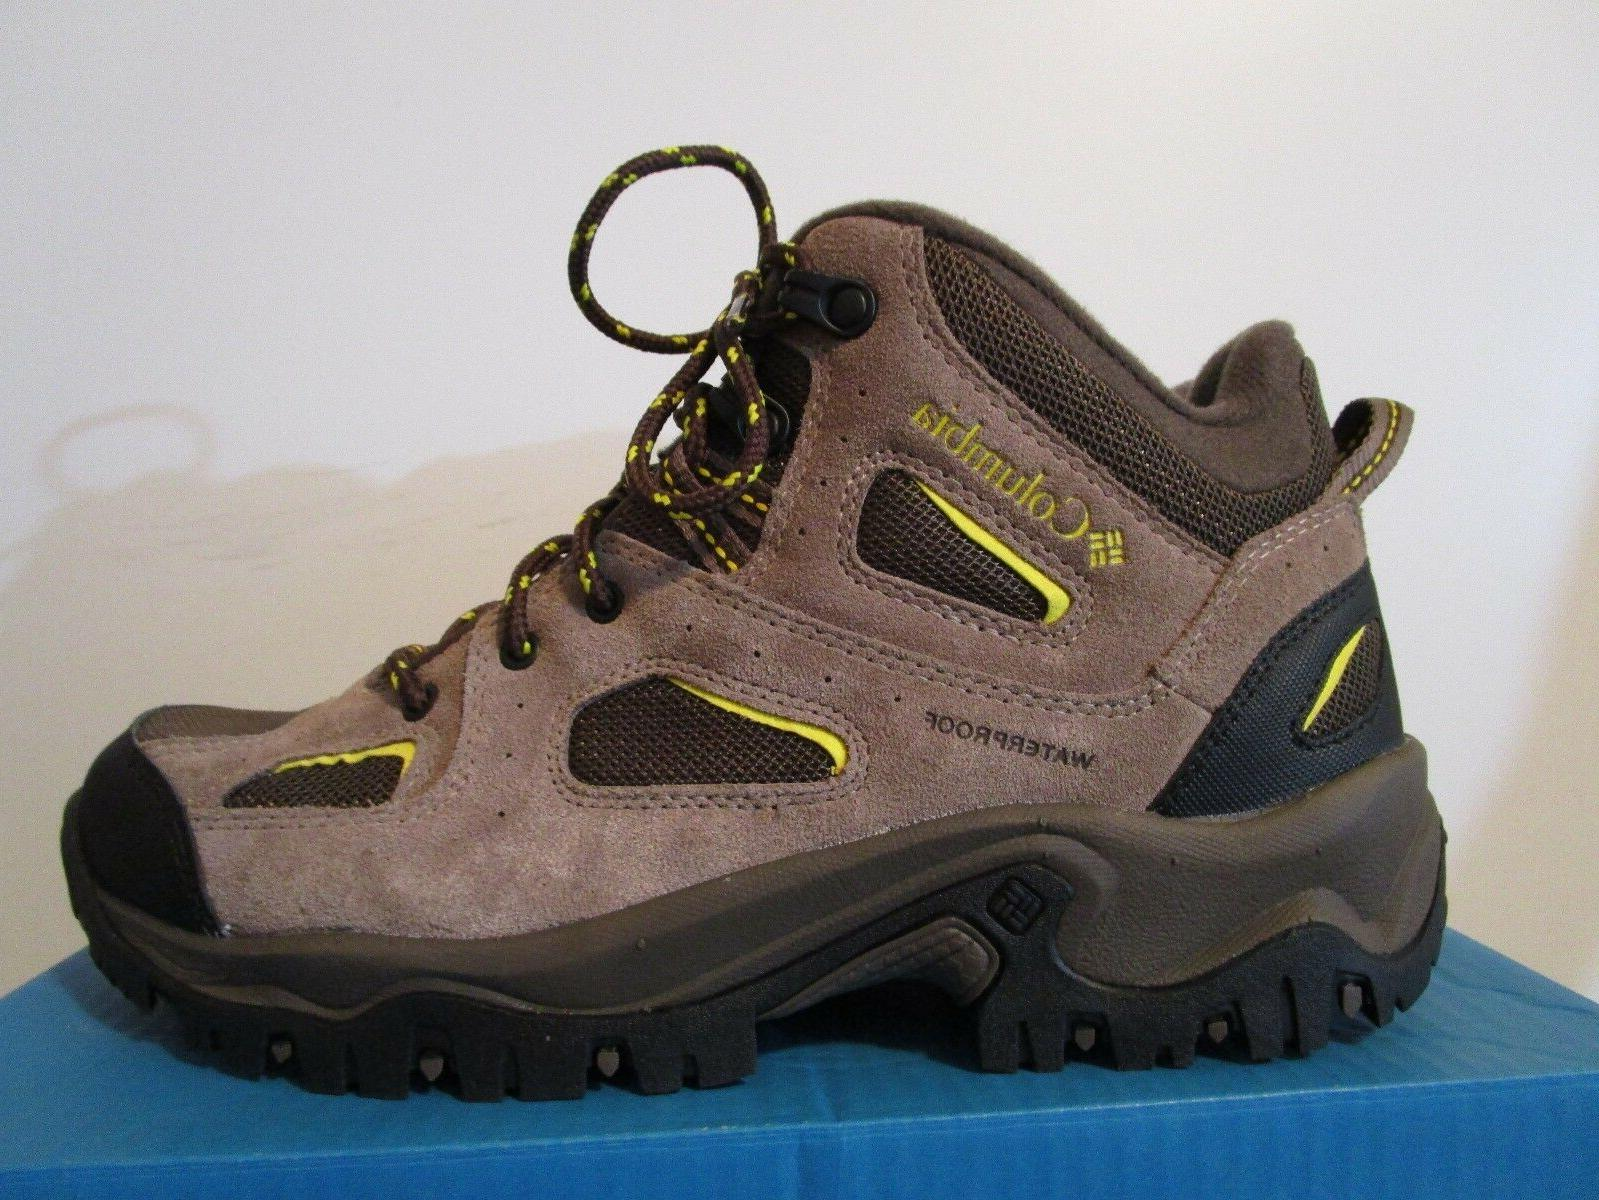 NIB II WP Waterproof Trail Hiker Boots